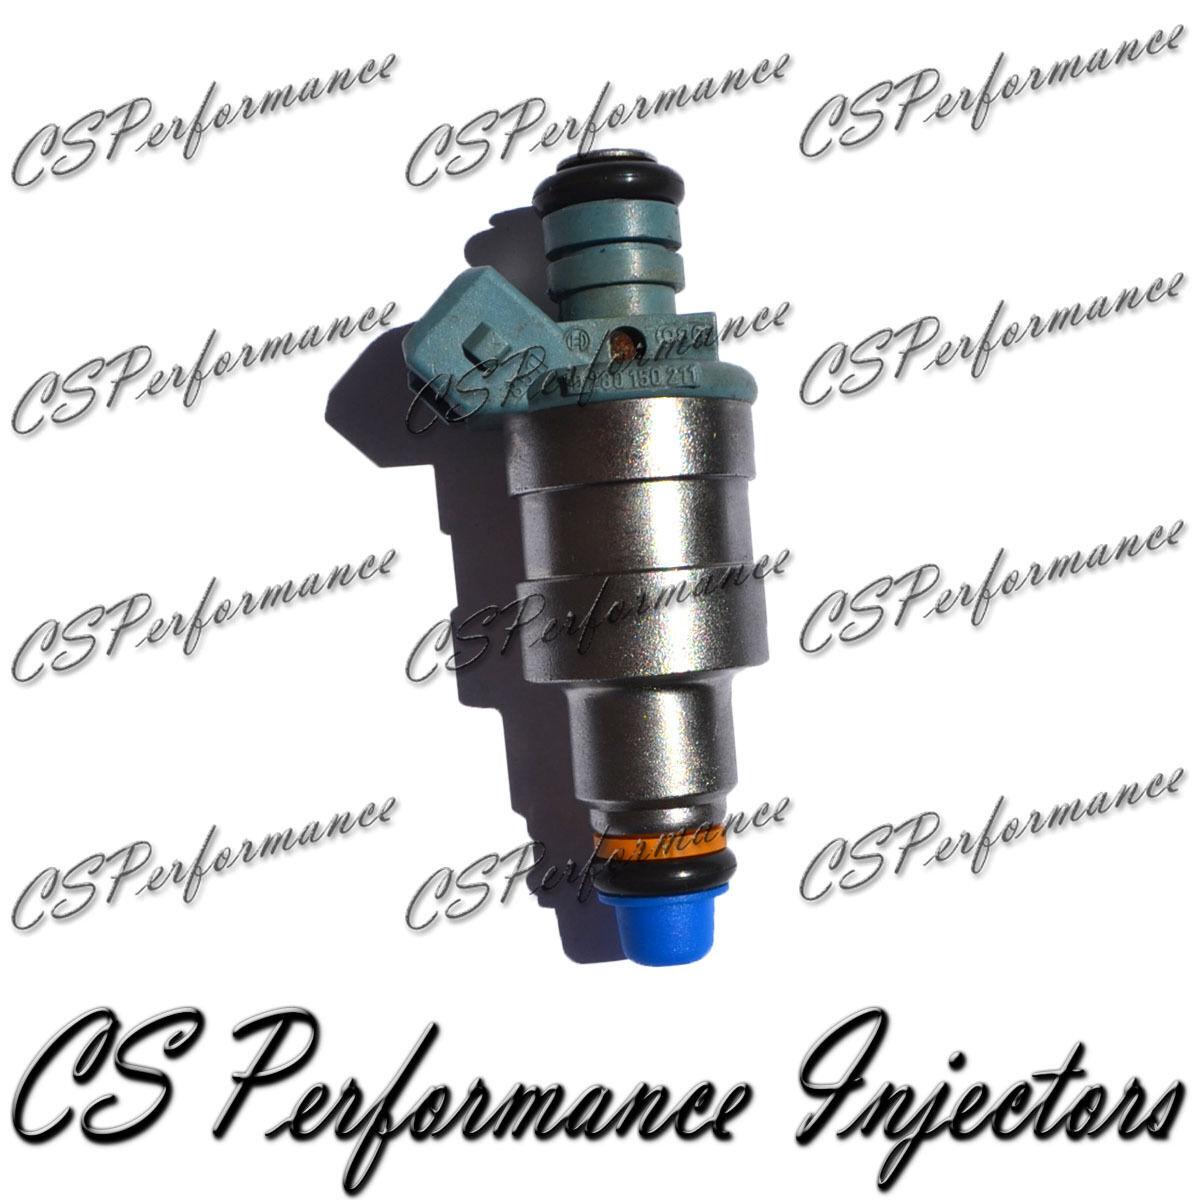 OEM Bosch Fuel Injectors Set 0280150217 Rebuilt by Master ASE Mechanic USA 6